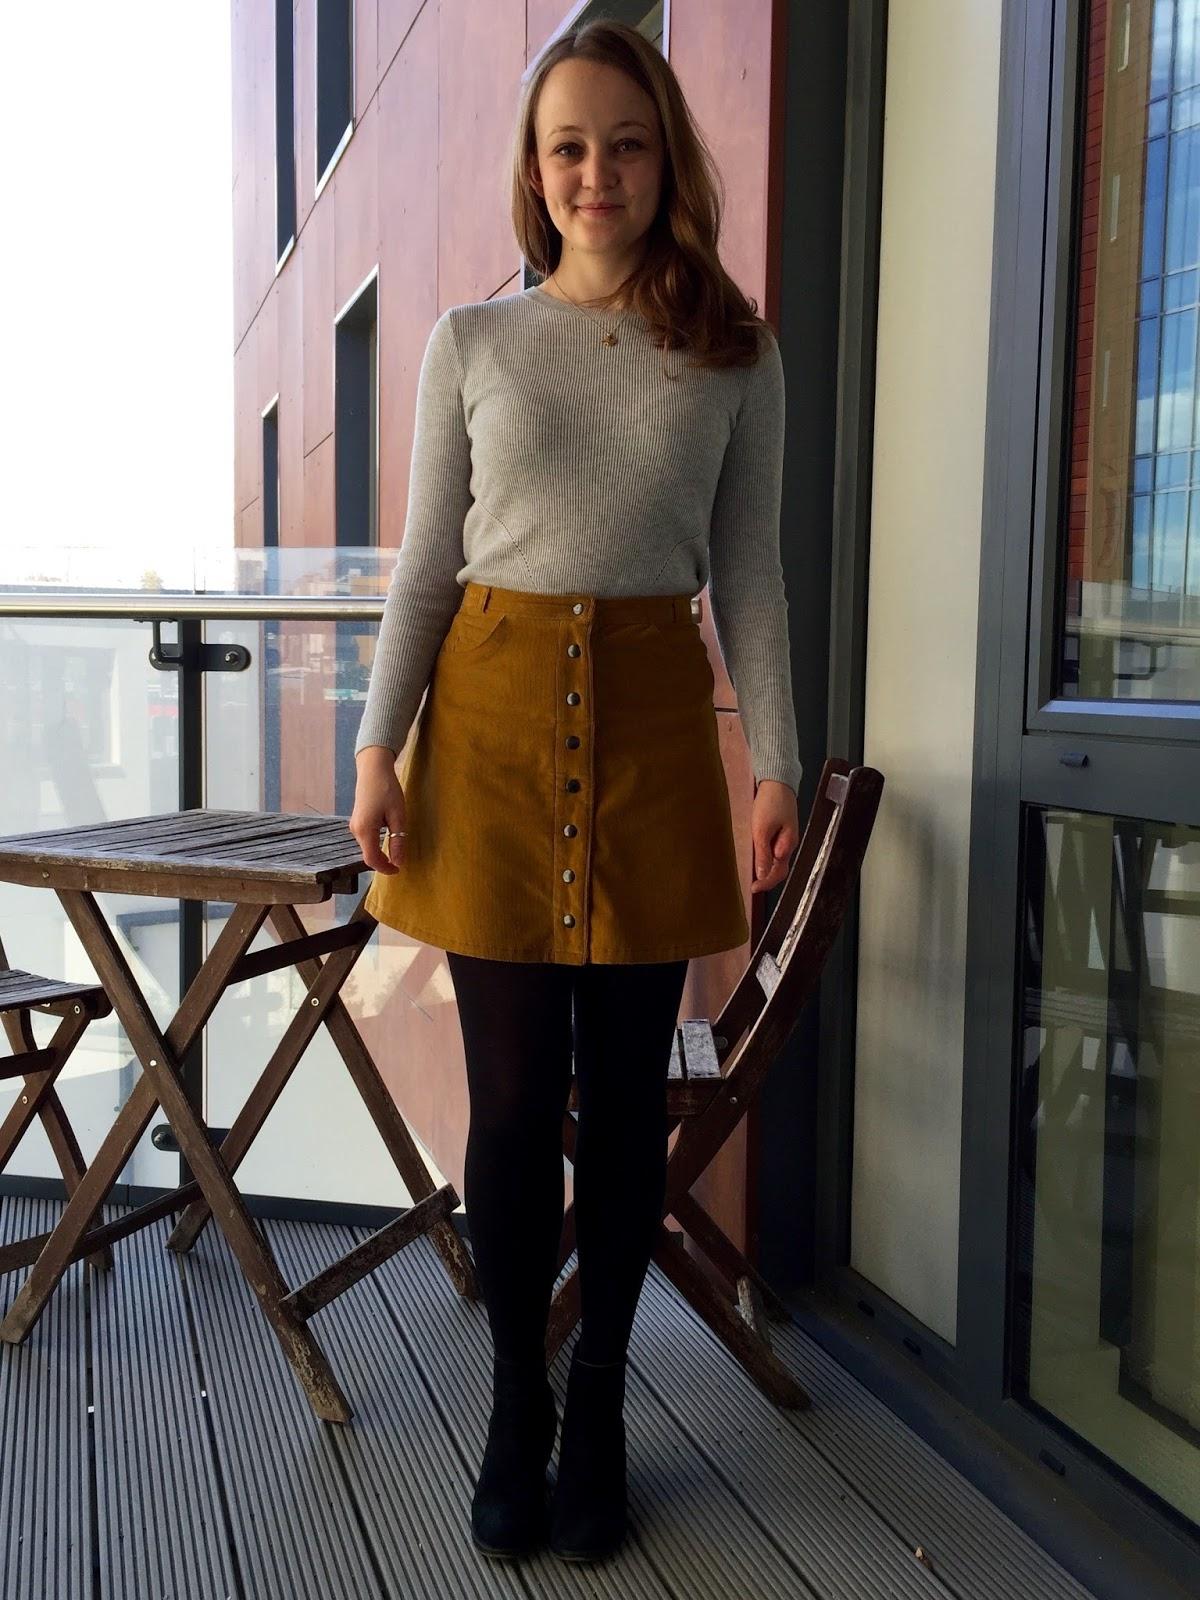 dd09ba30fb0b4d Diary of a Chain Stitcher: Honey Mustard Cotton Corduroy Rosari Mini Skirt  from Pauline Alice